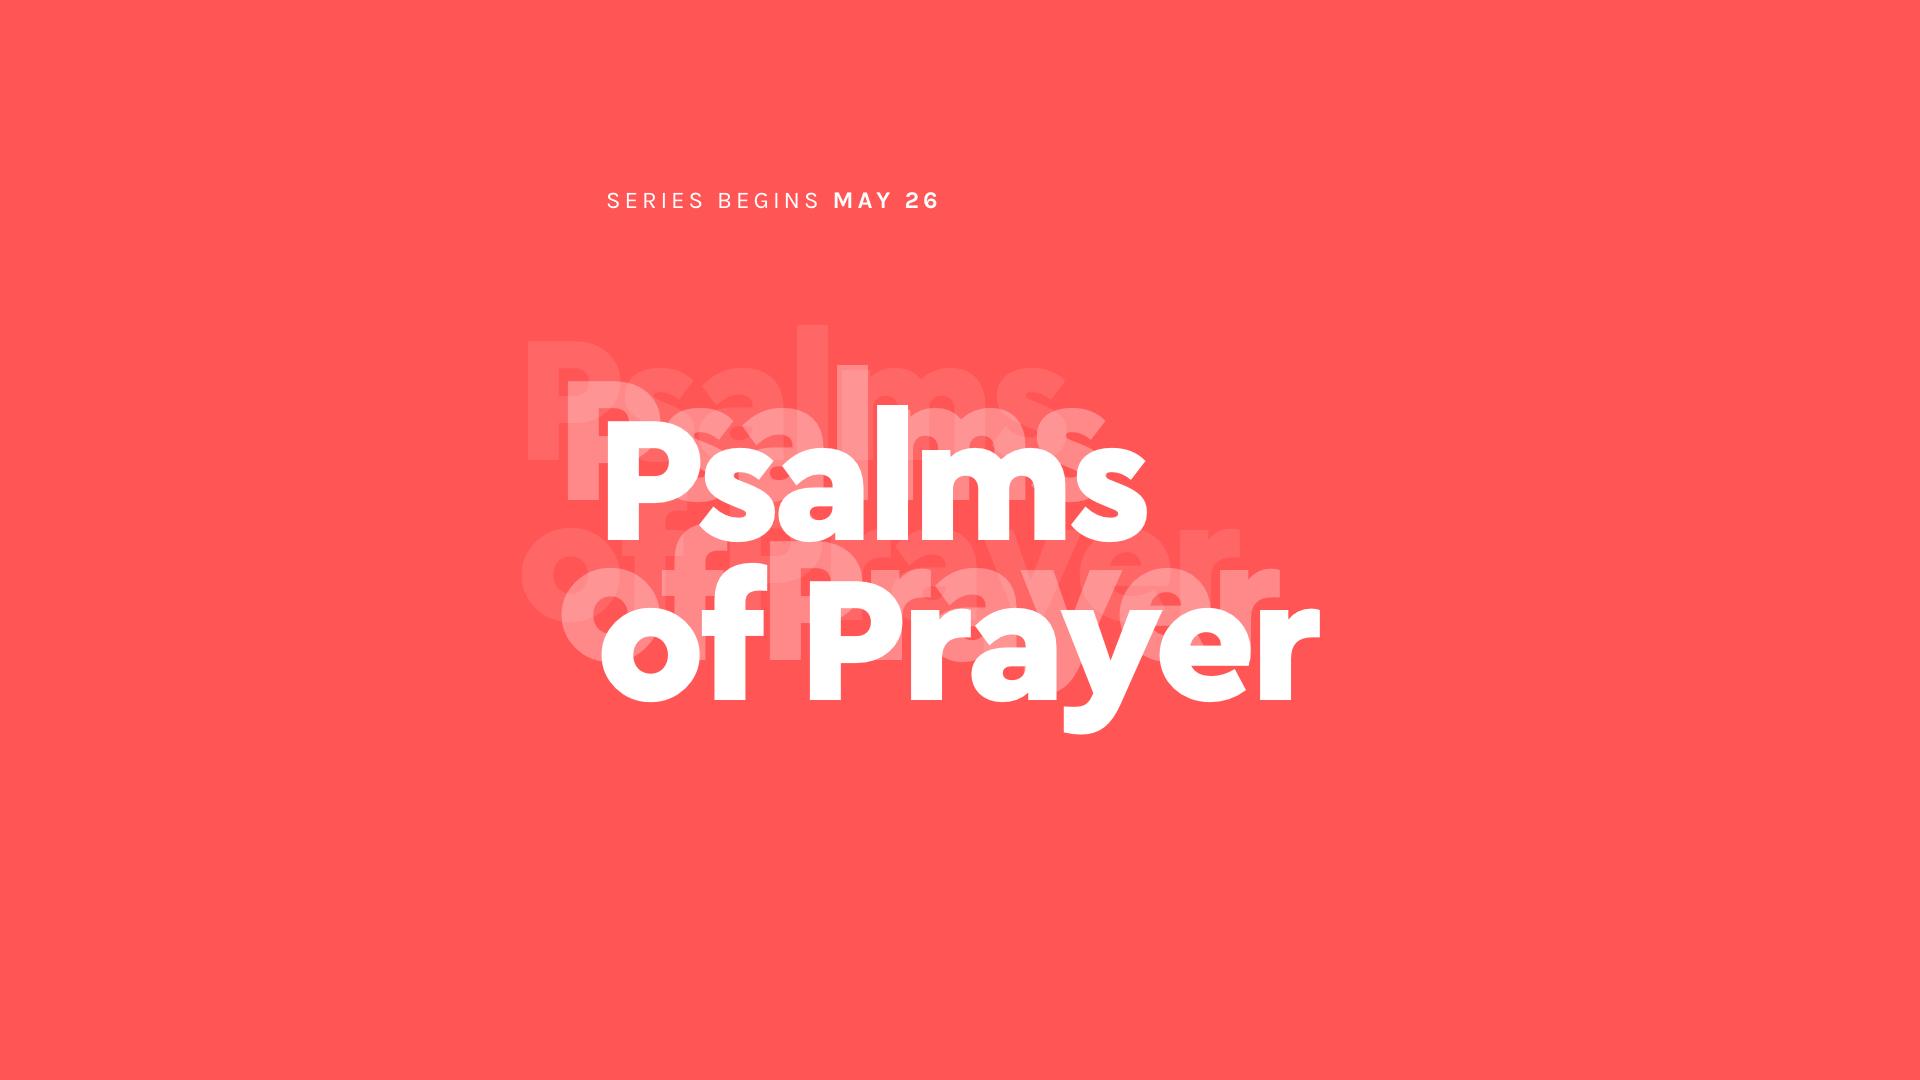 Psalms-HD-Date.png